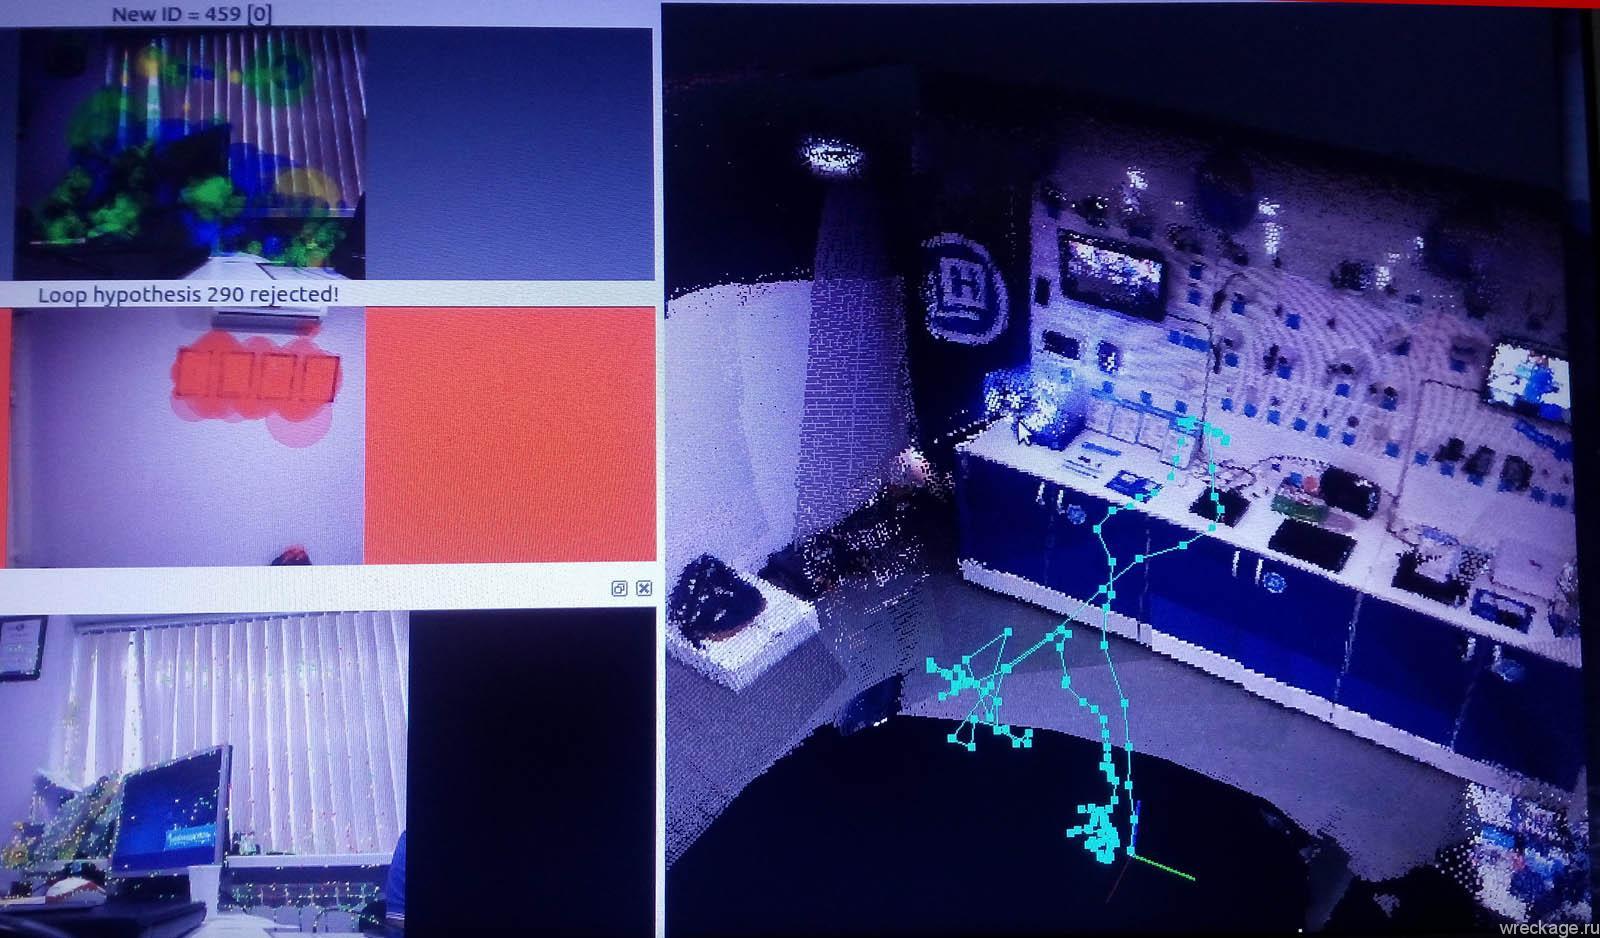 kinect xbox 360 к компьютеру, как подключить